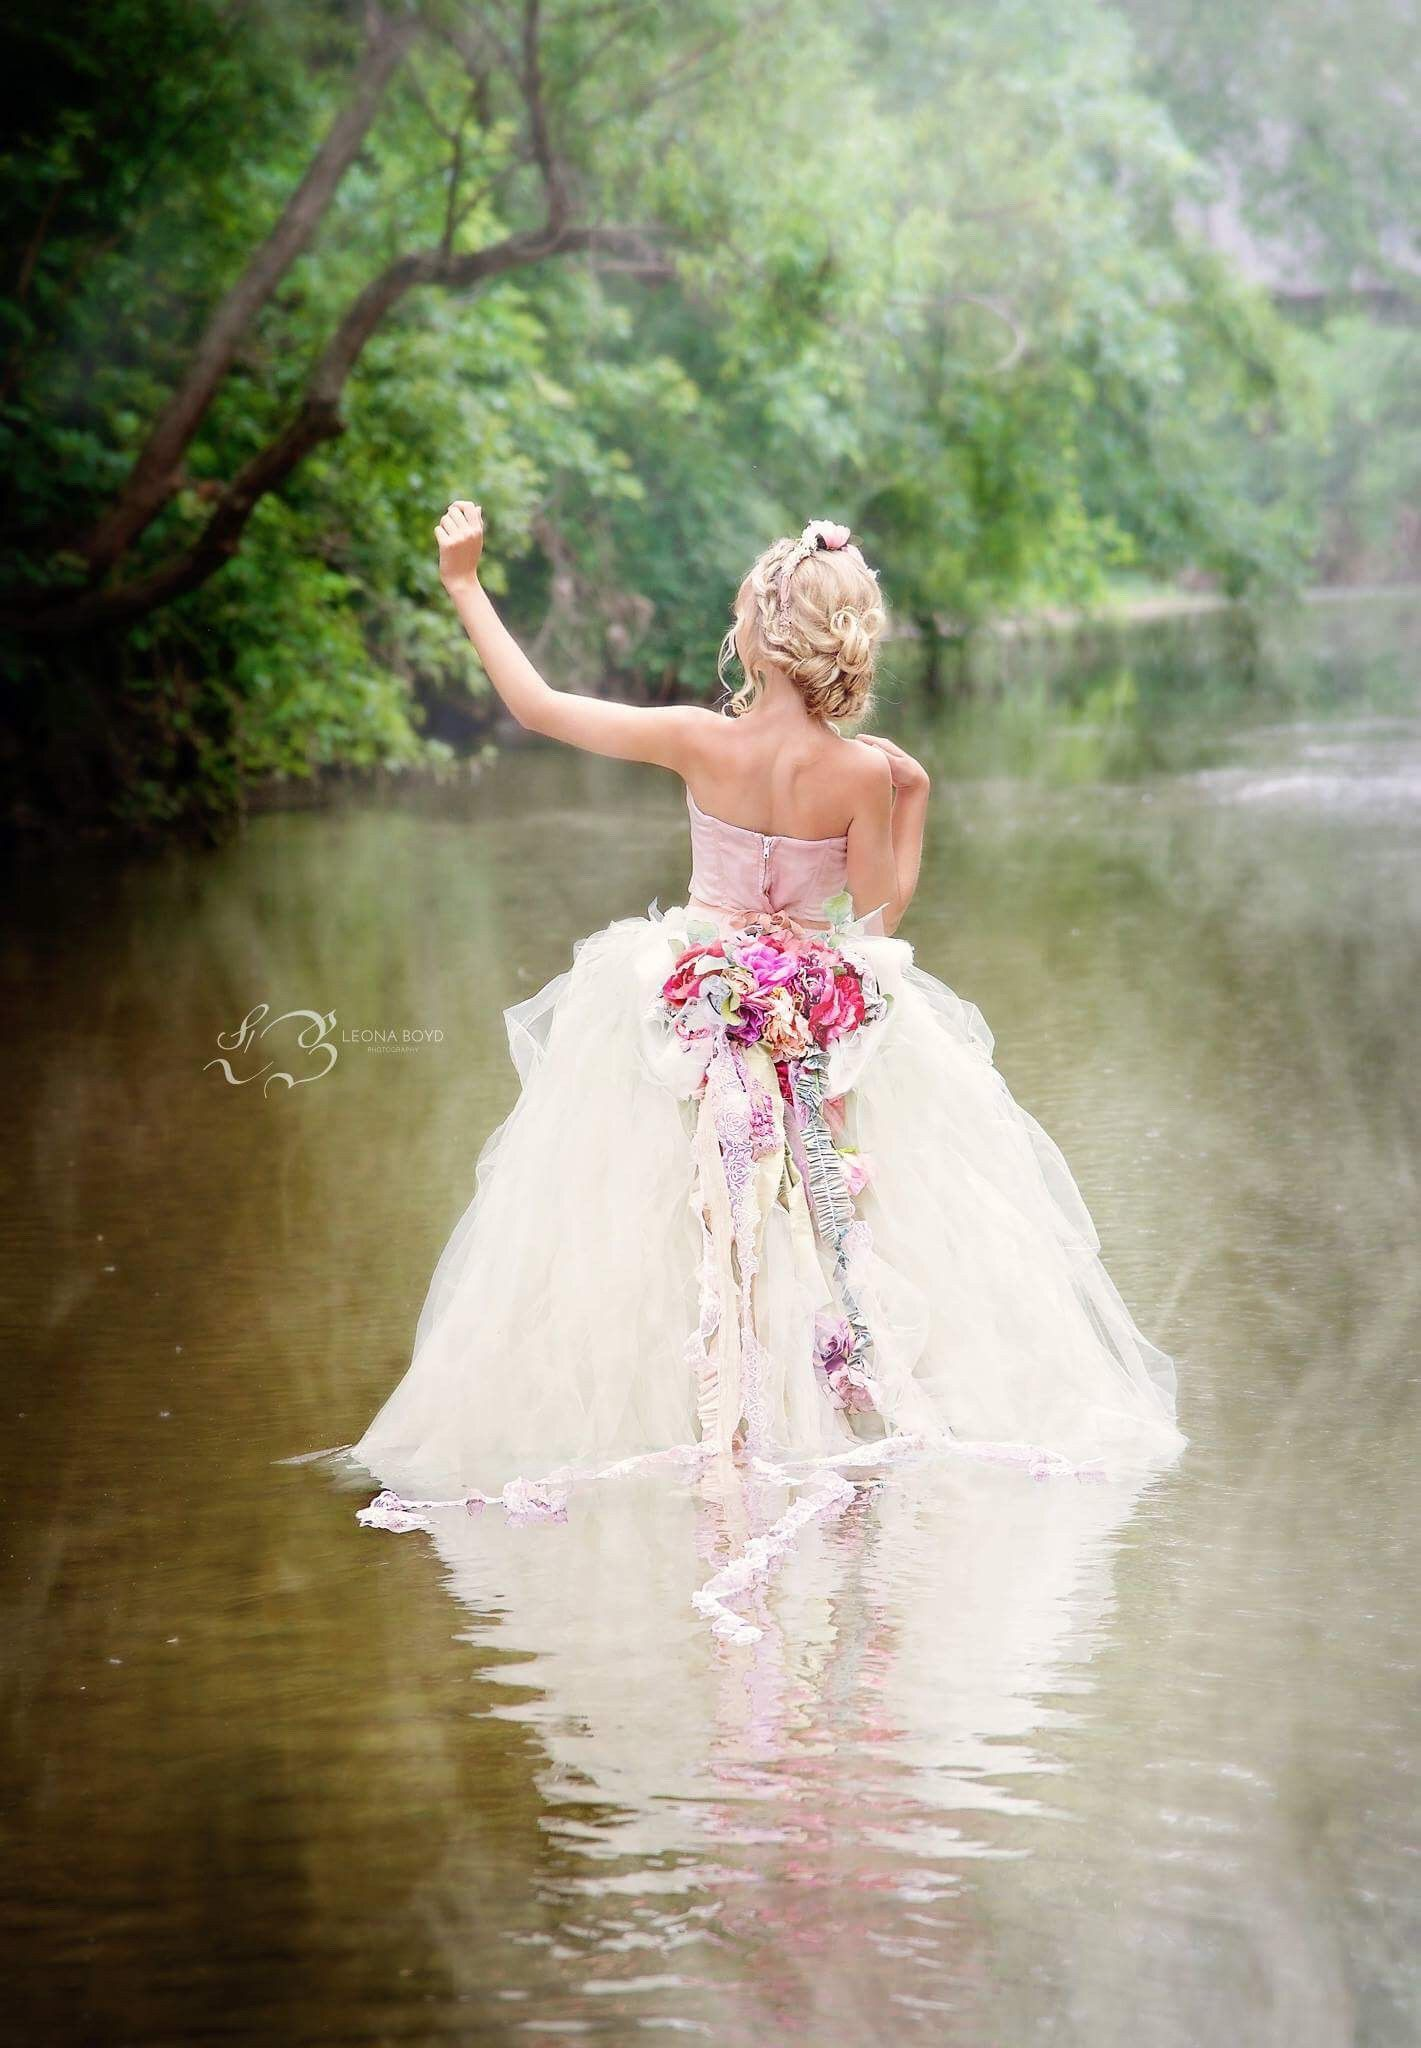 Tutu Skirt and Corset-Prom-Bridal-photography-RACHEL